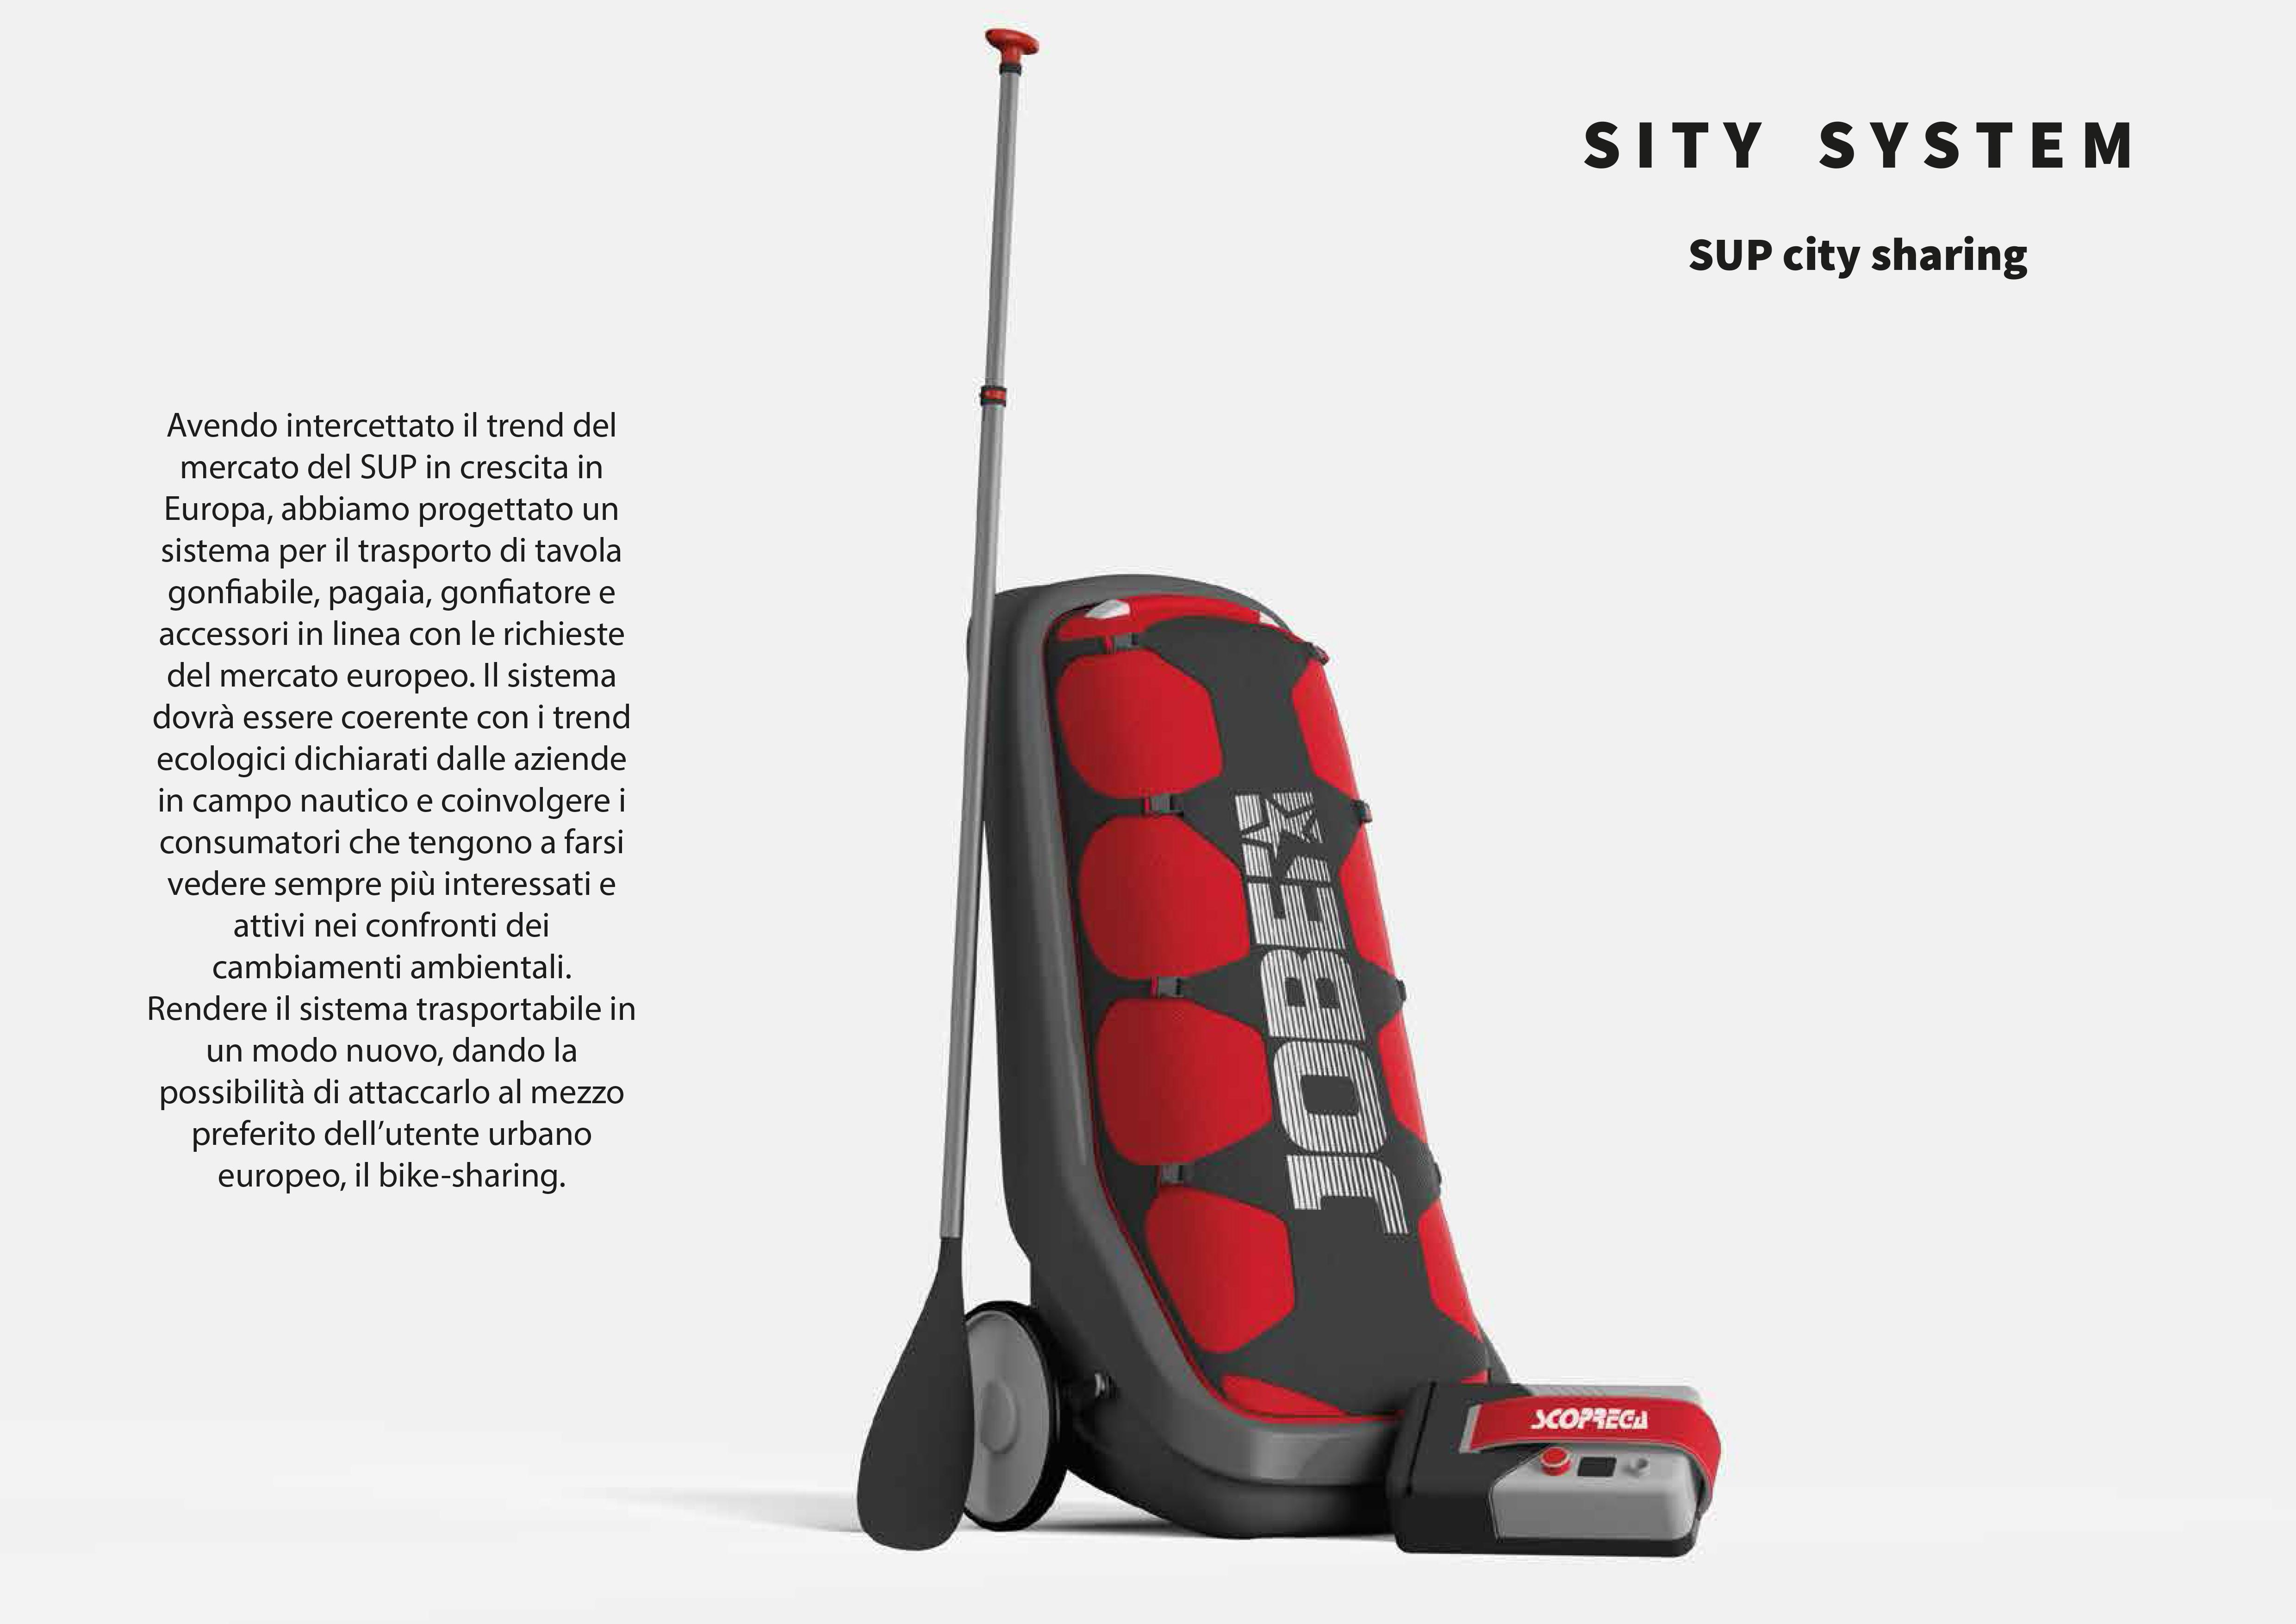 Sity System